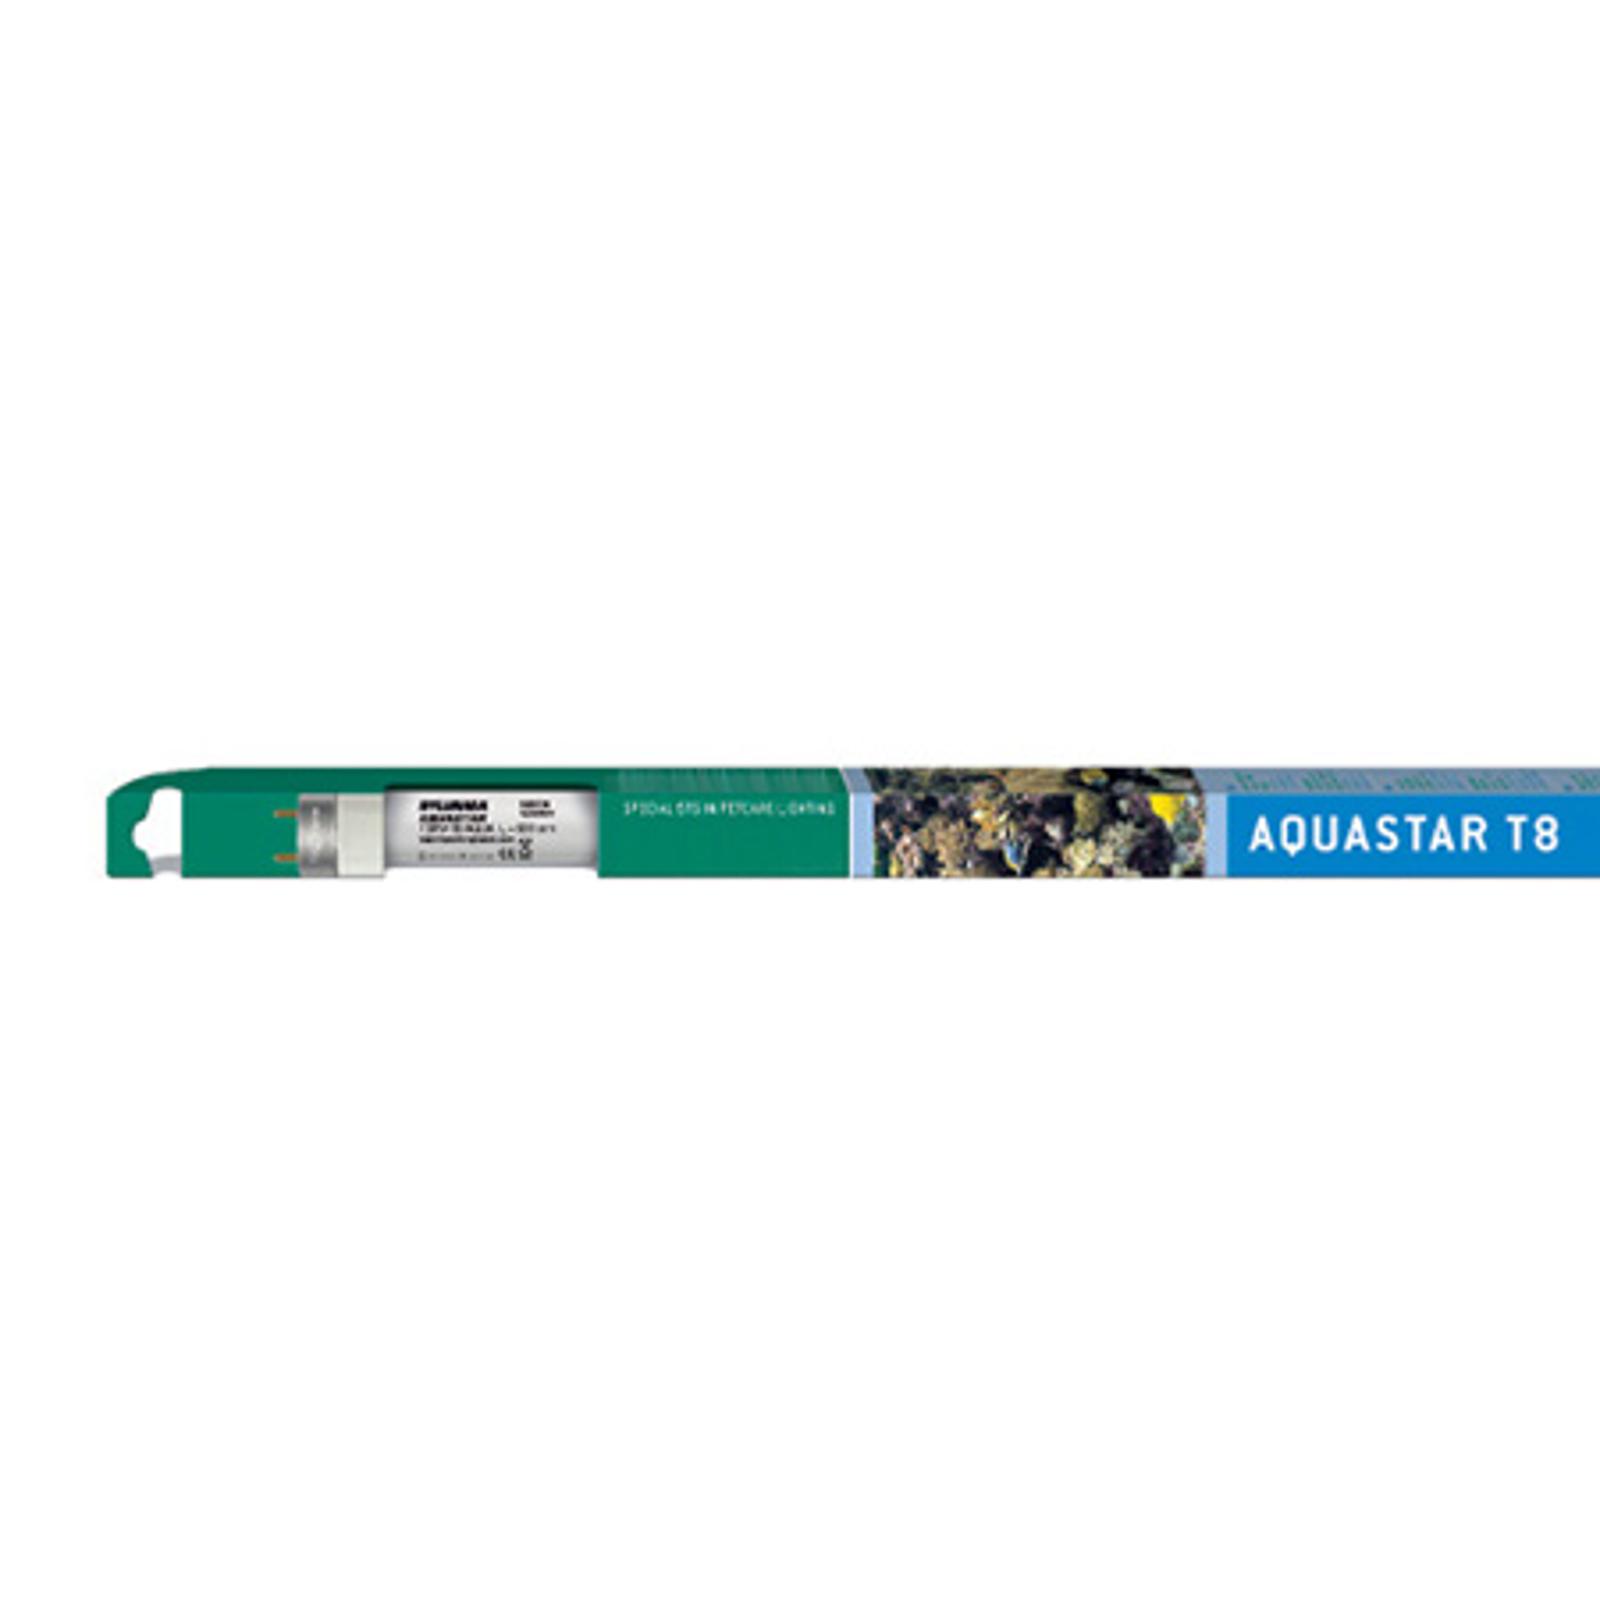 G13 T8 25 W Aquastar dagslys spesialpære